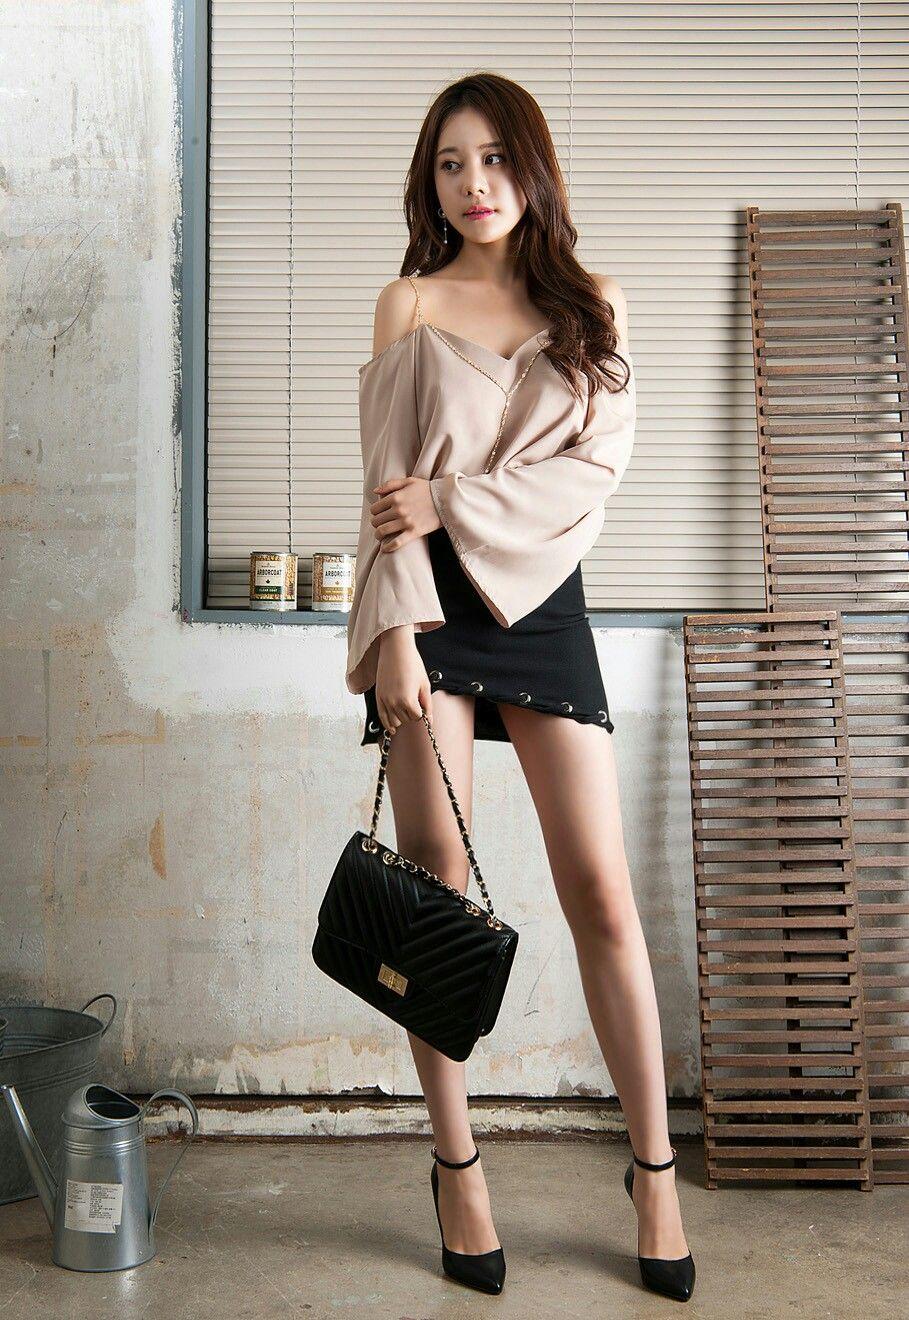 Asian mini models